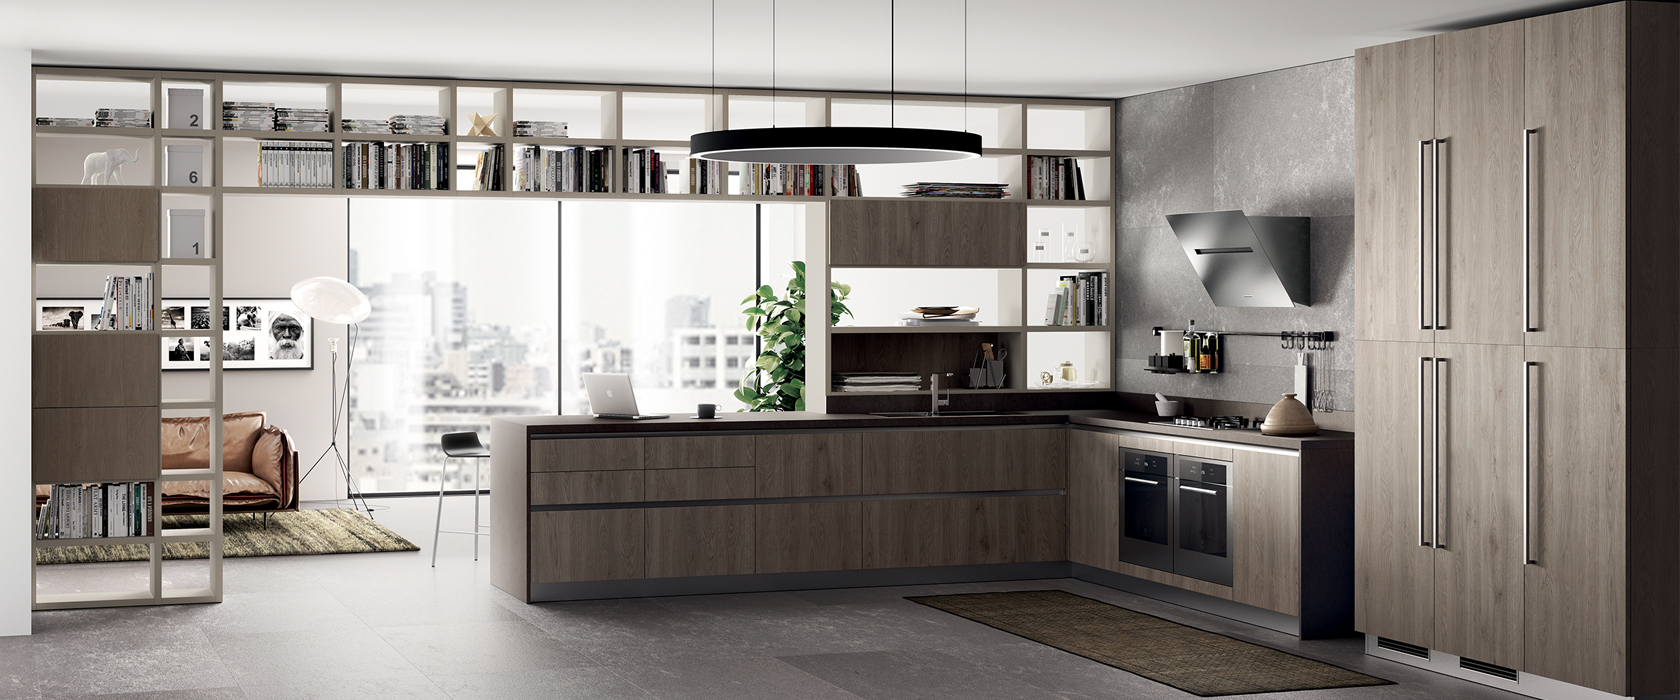 Cucine scavolini a Modena da Arredi e Interni